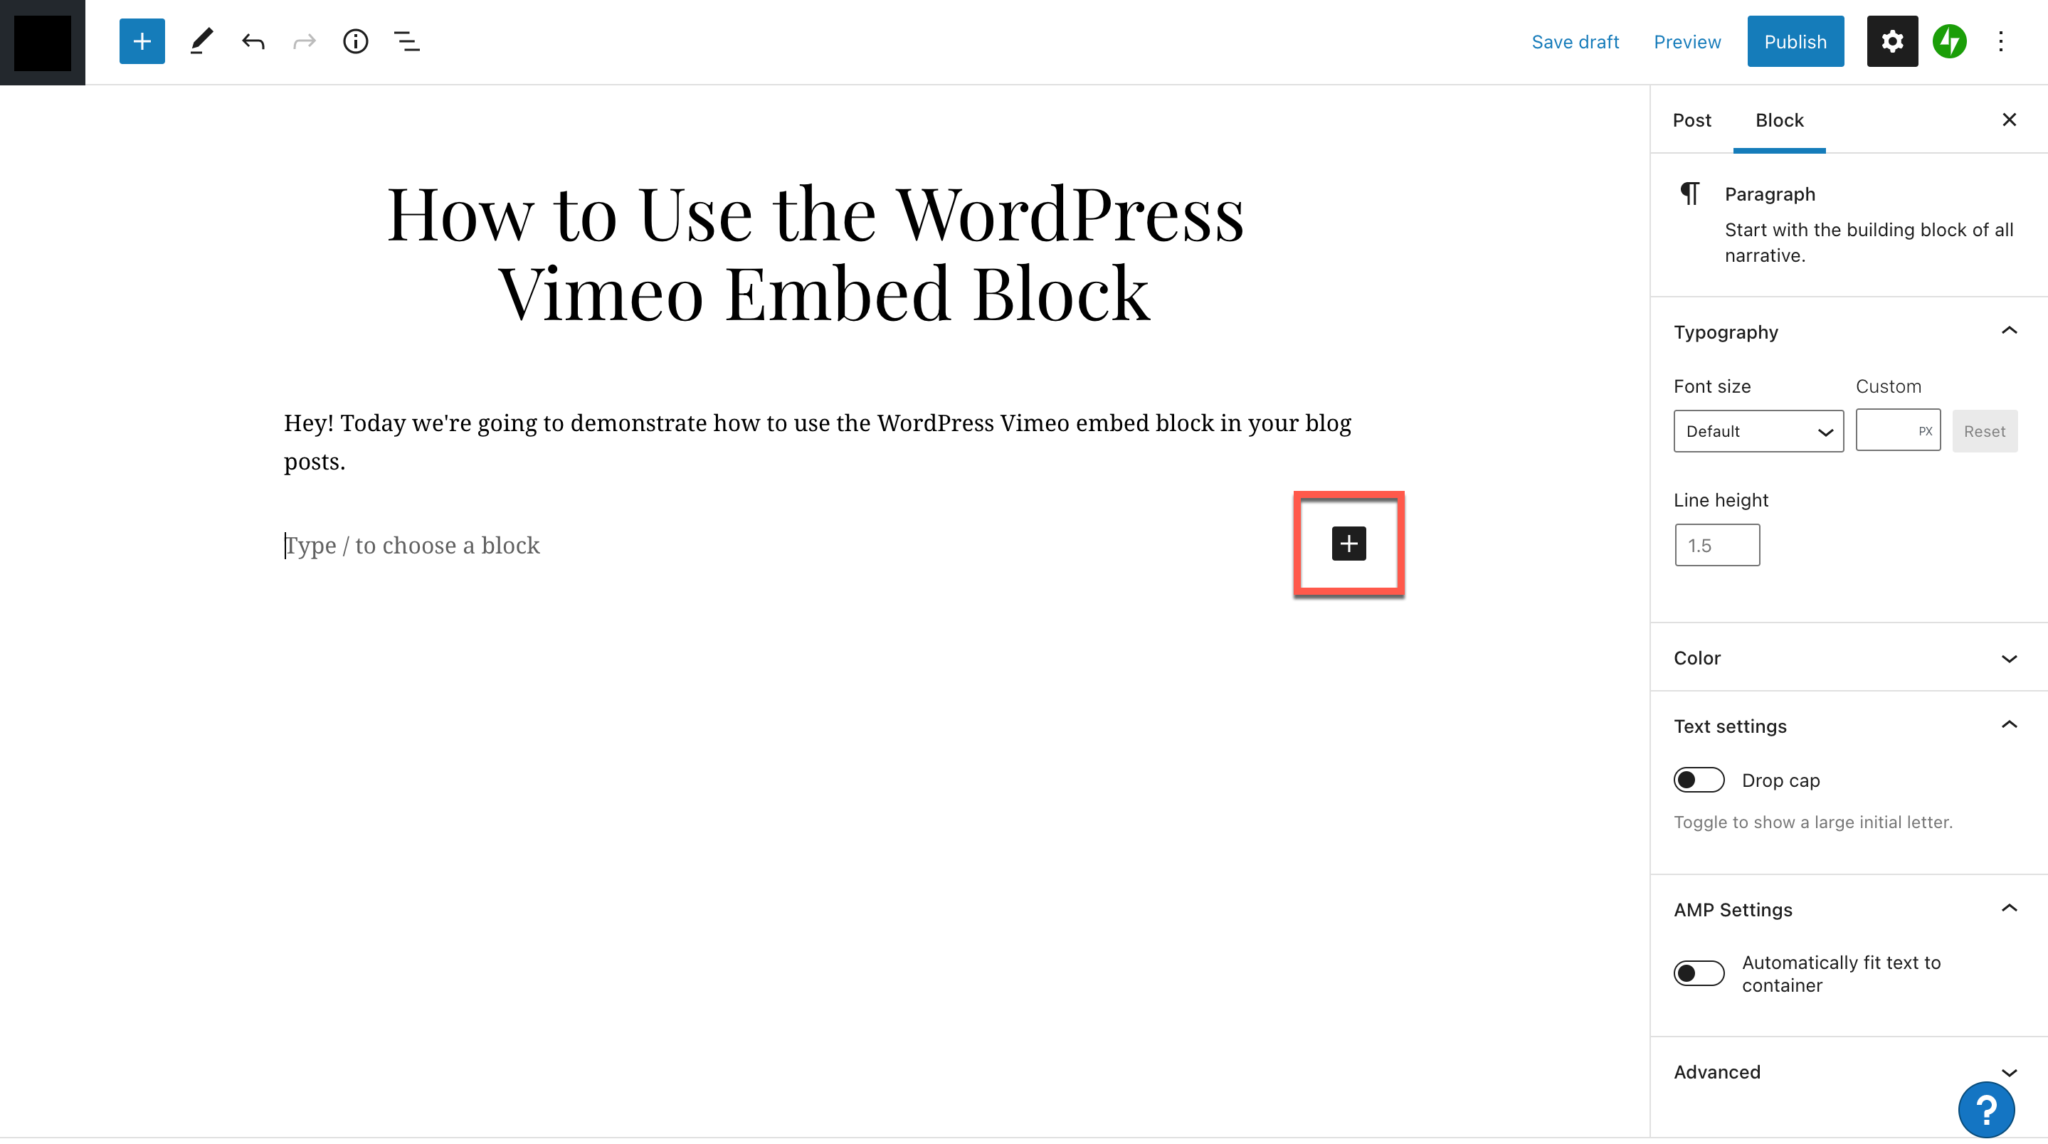 How to Use the WordPress Vimeo Embed Block